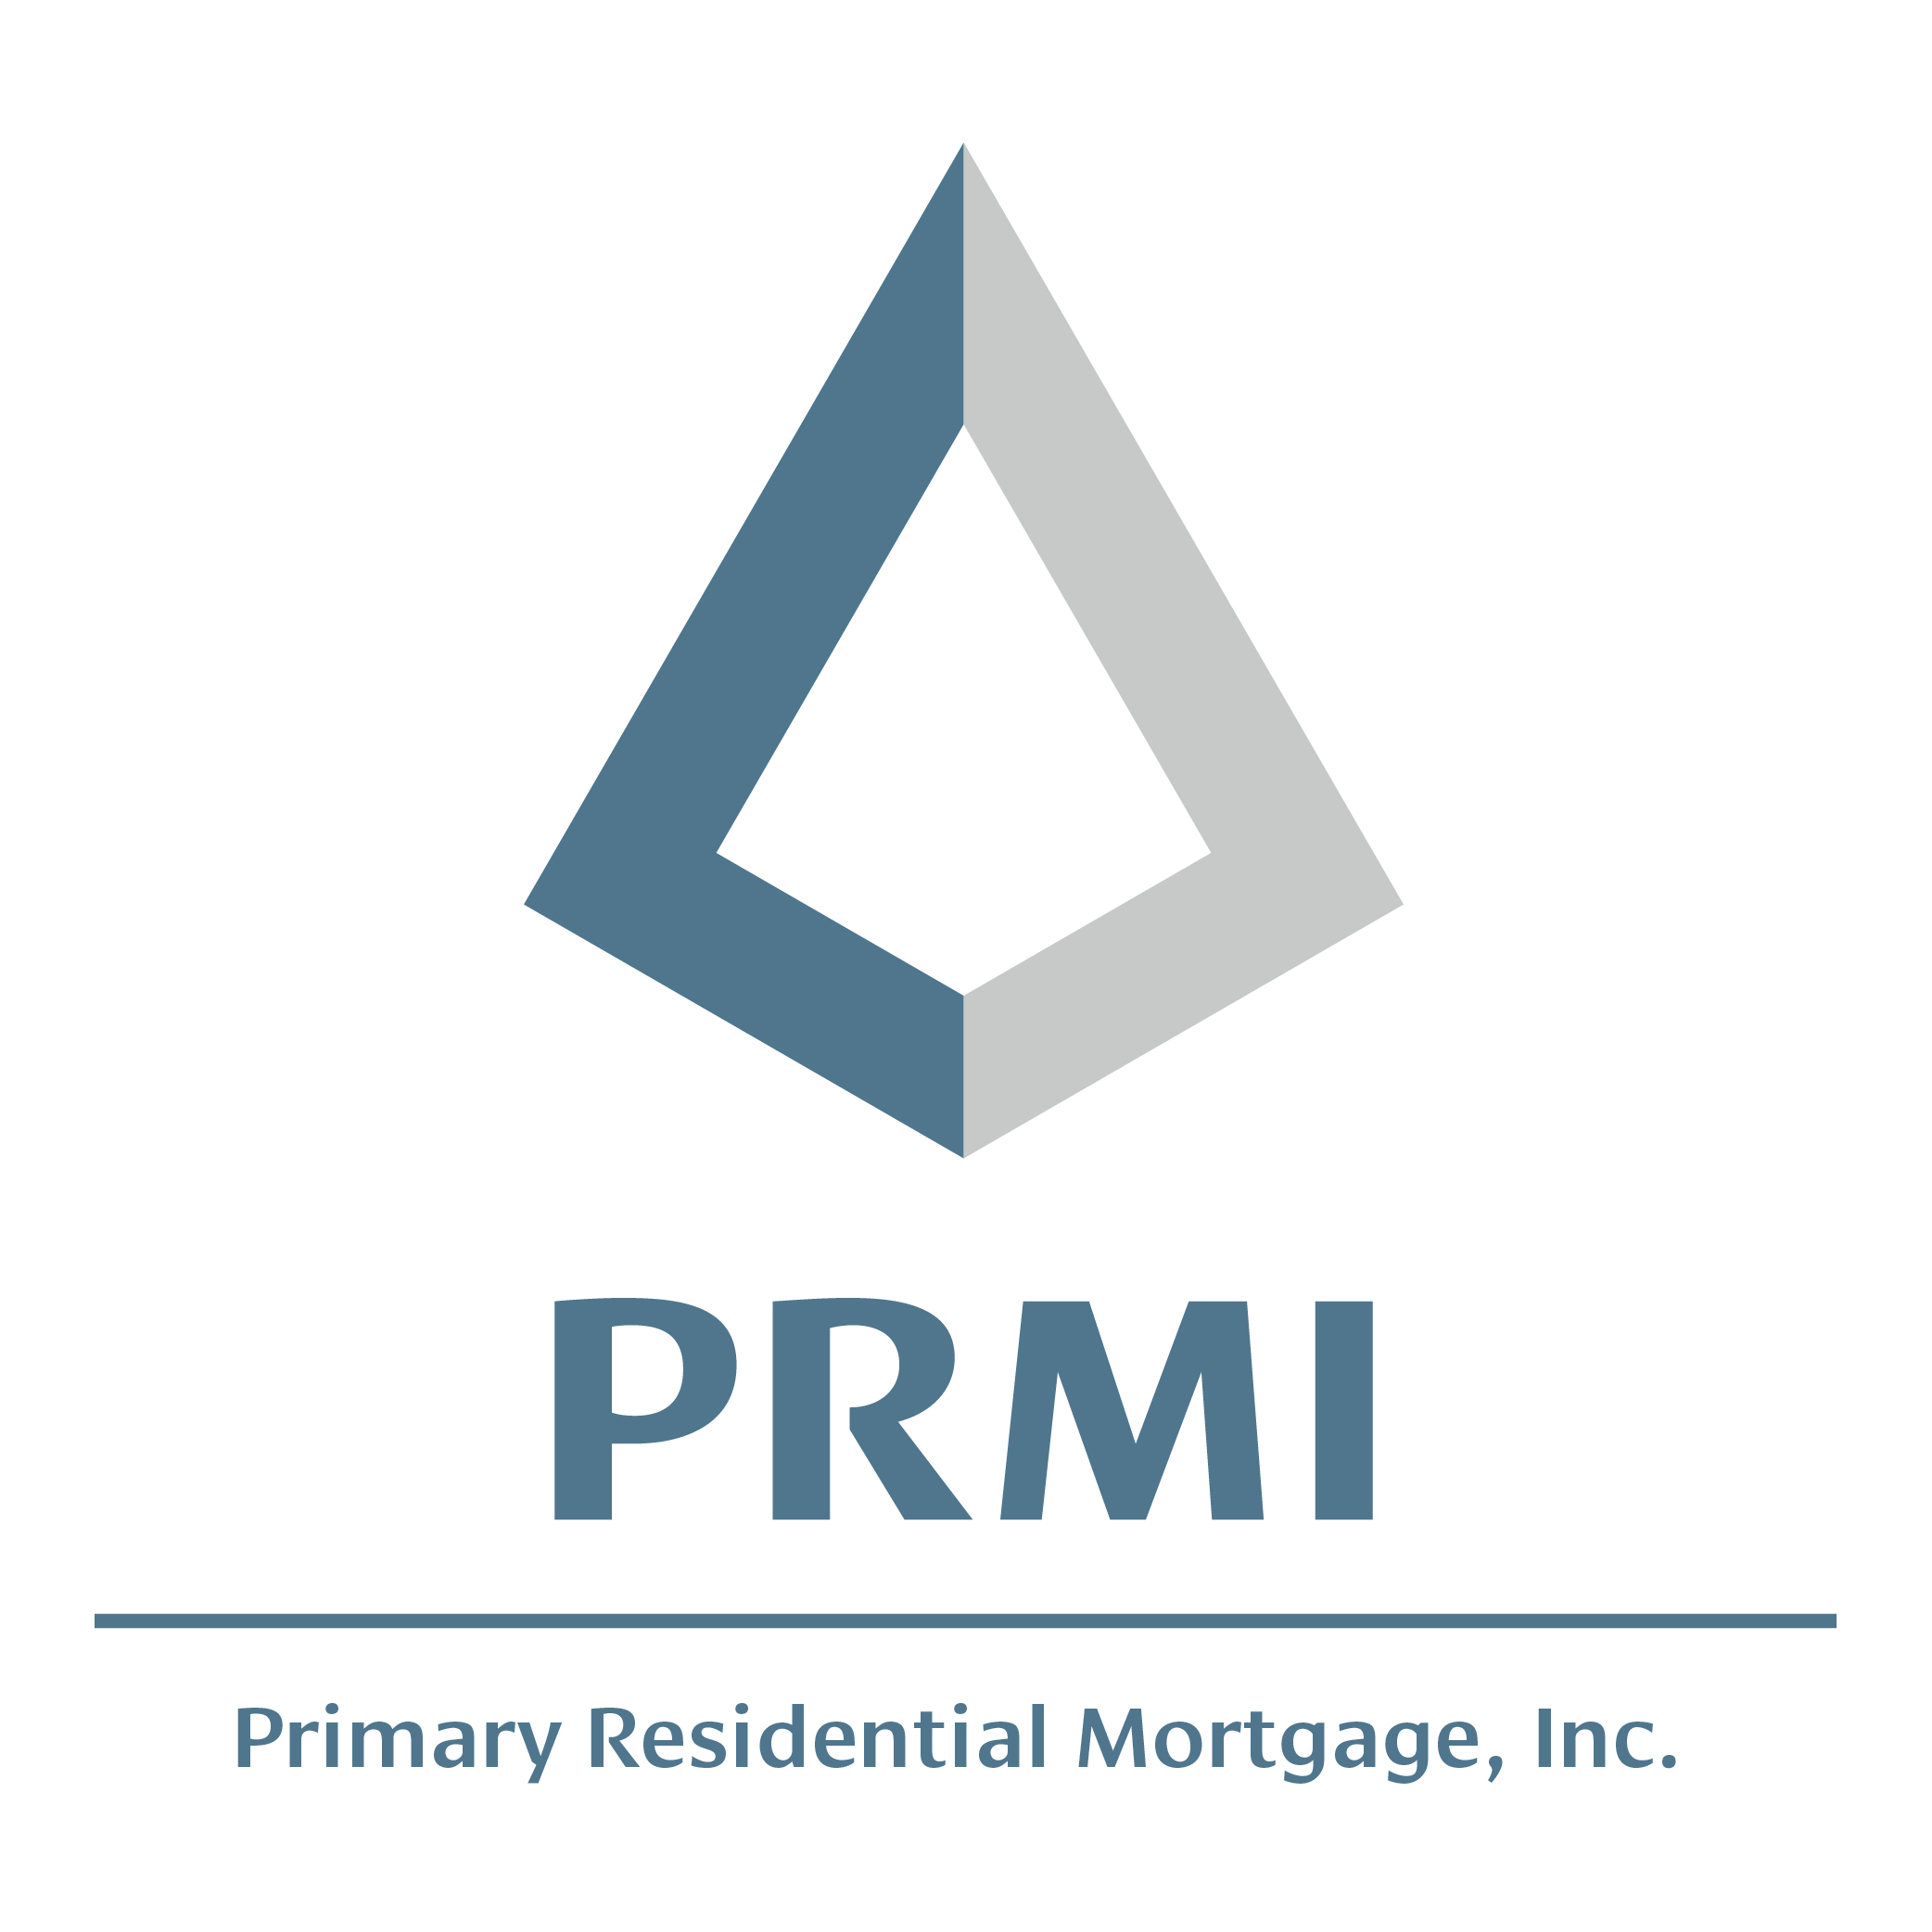 Primary Residential Mortgage, Inc. - Stockton, CA 95207 - (209)951-5100 | ShowMeLocal.com